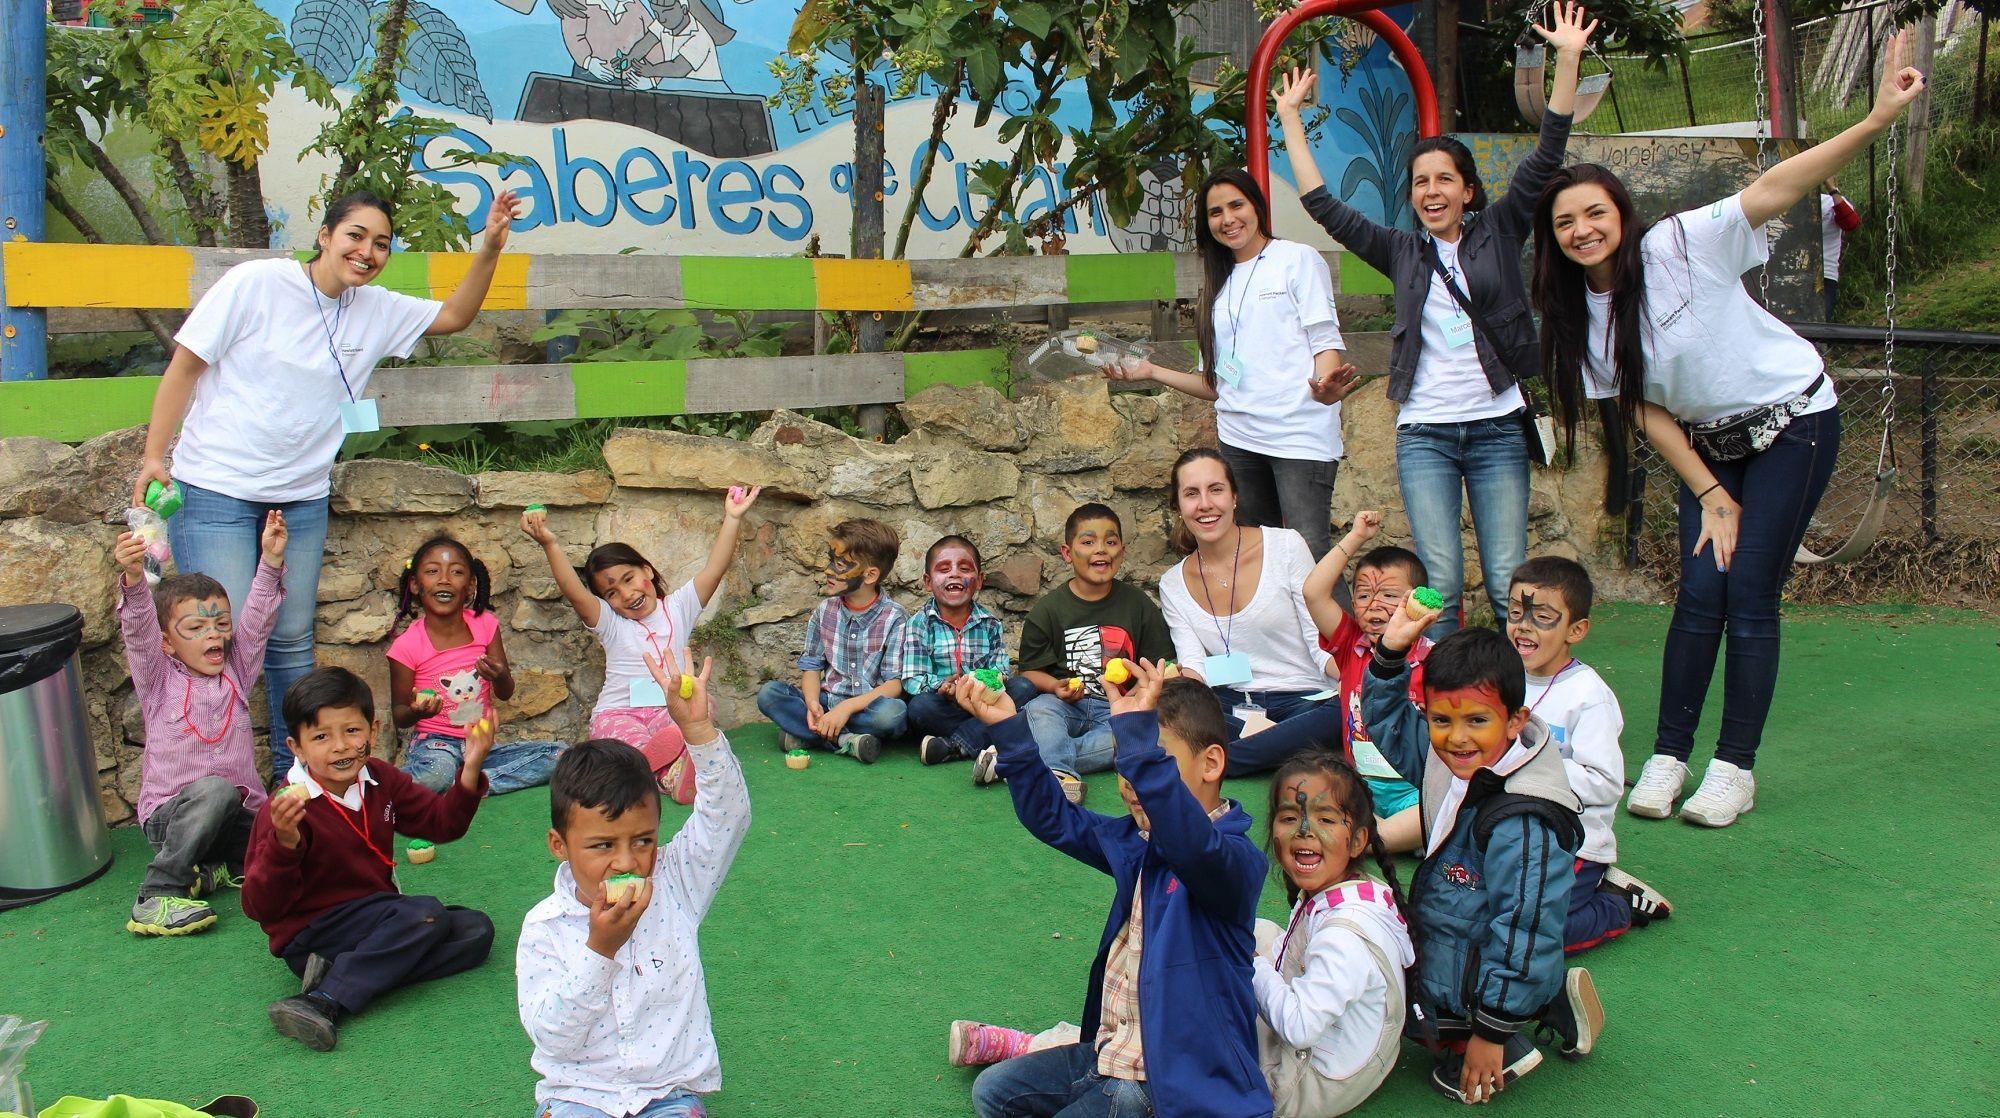 HPE Volunteering activity in Colombia.